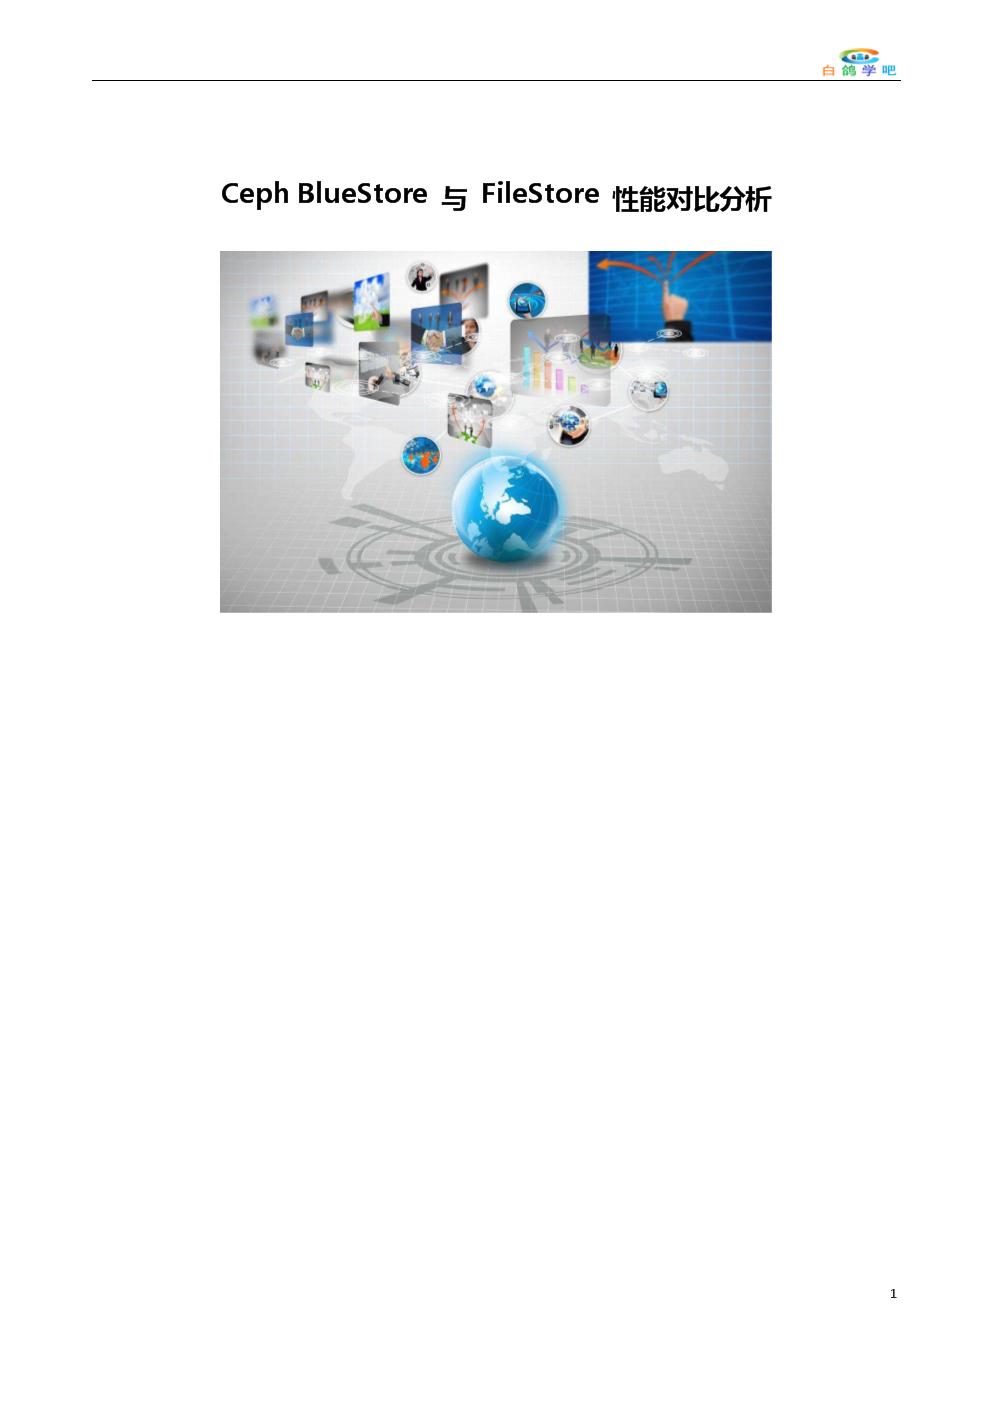 Ceph BlueStore与FileStore性能对比分析 docx